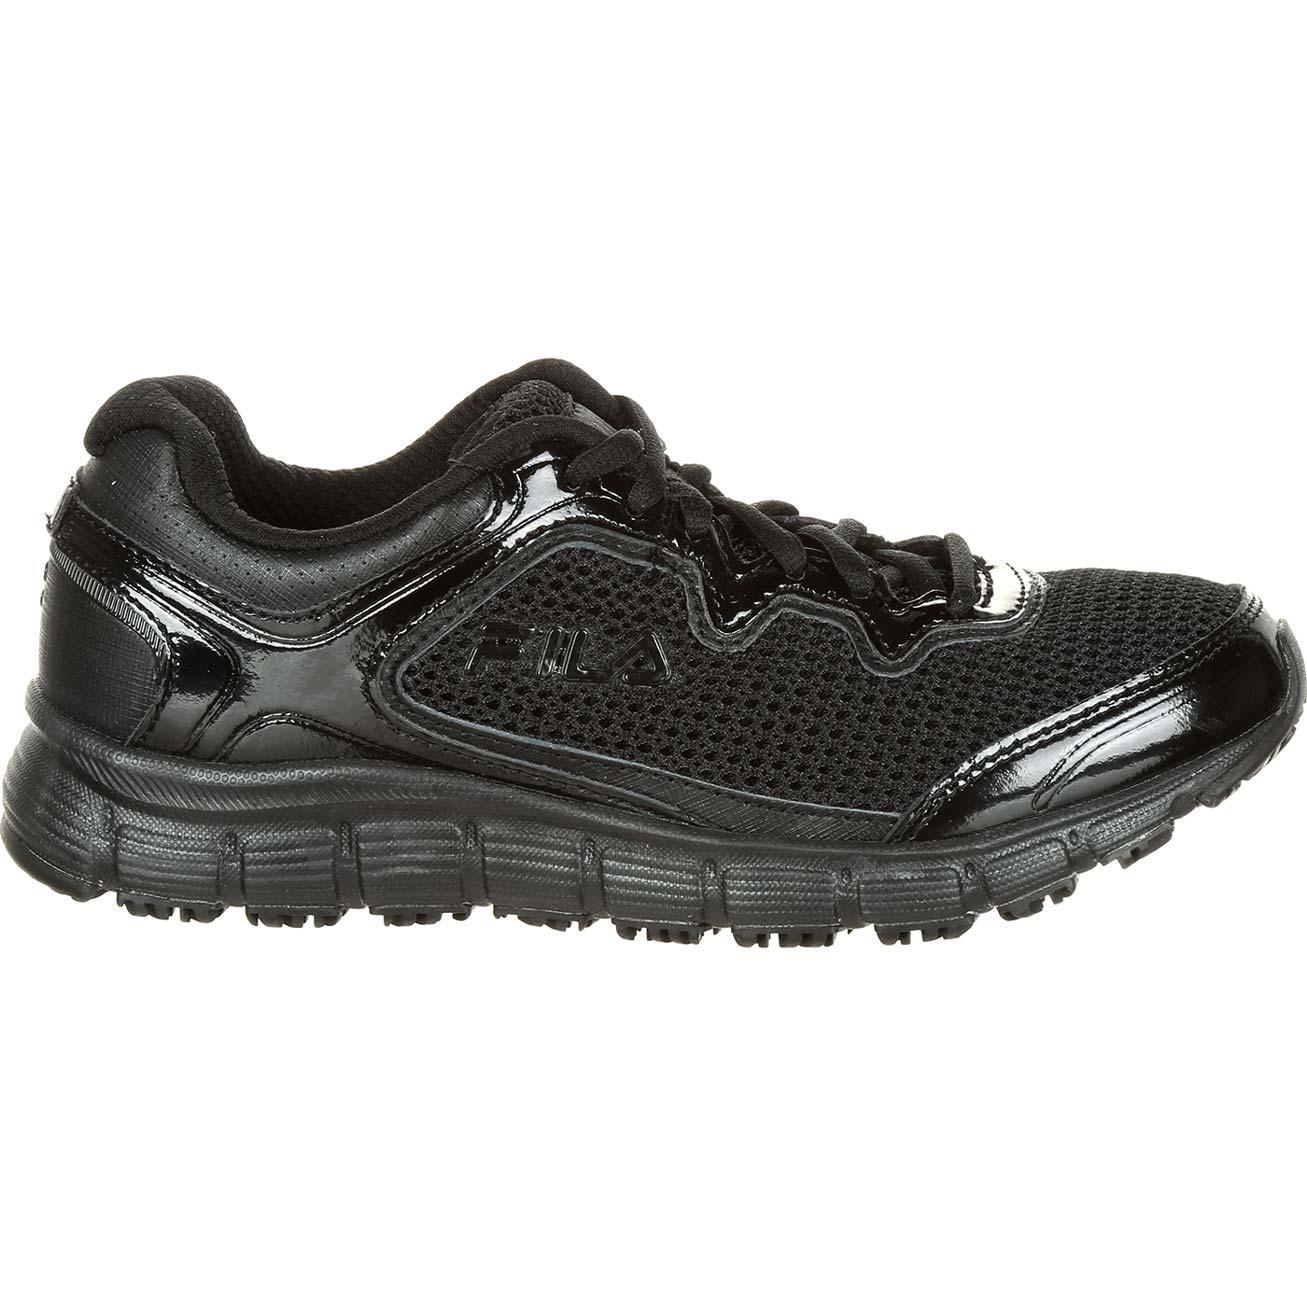 fa13819629cc Images. Fila Memory Fresh Start Women s Slip-Resistant Work Athletic Shoe  ...